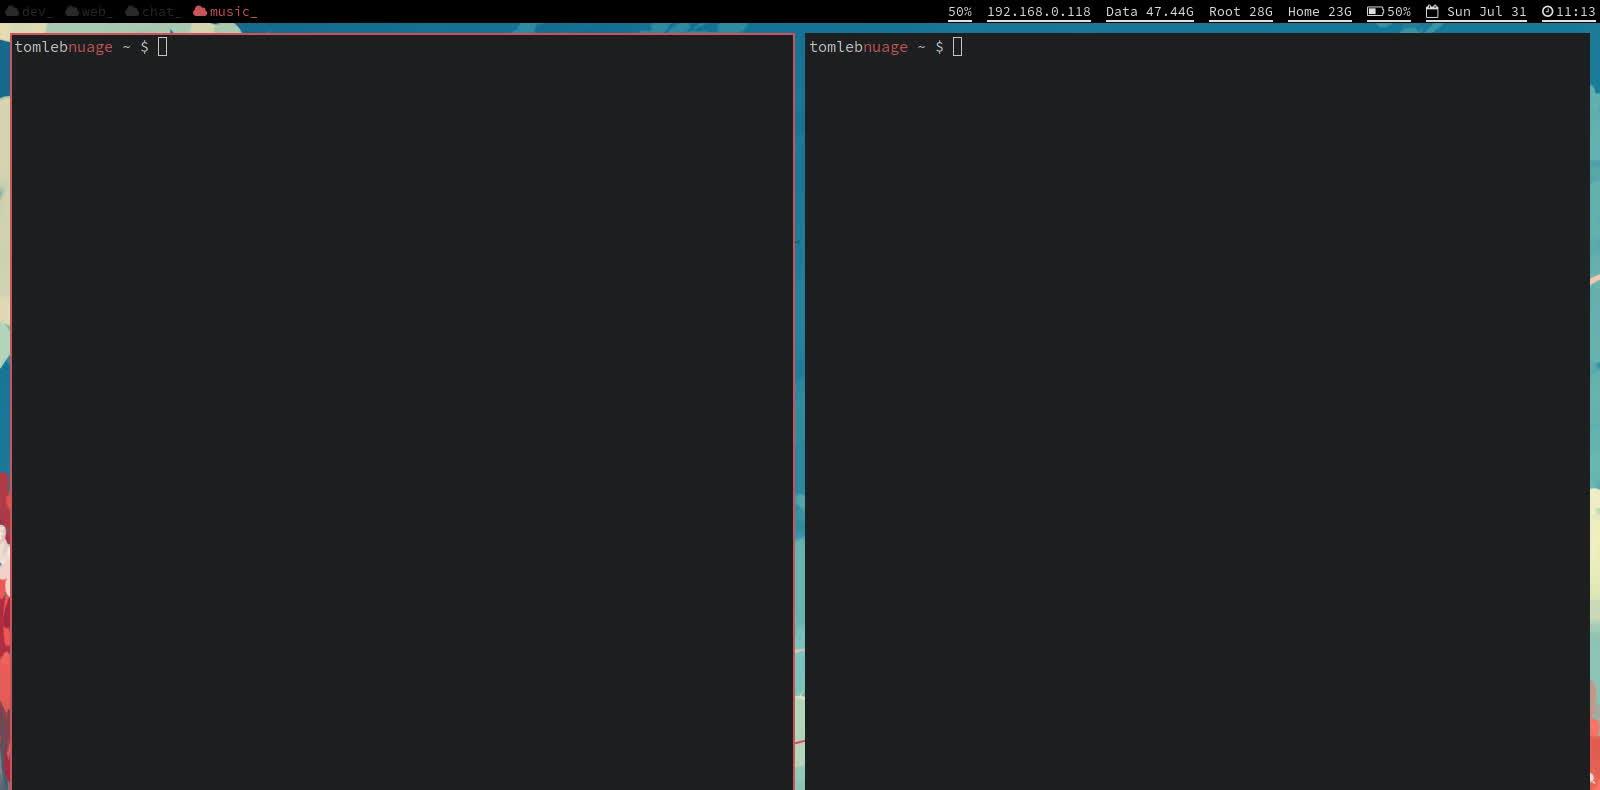 archlinux, Weird compton glitches GIFs